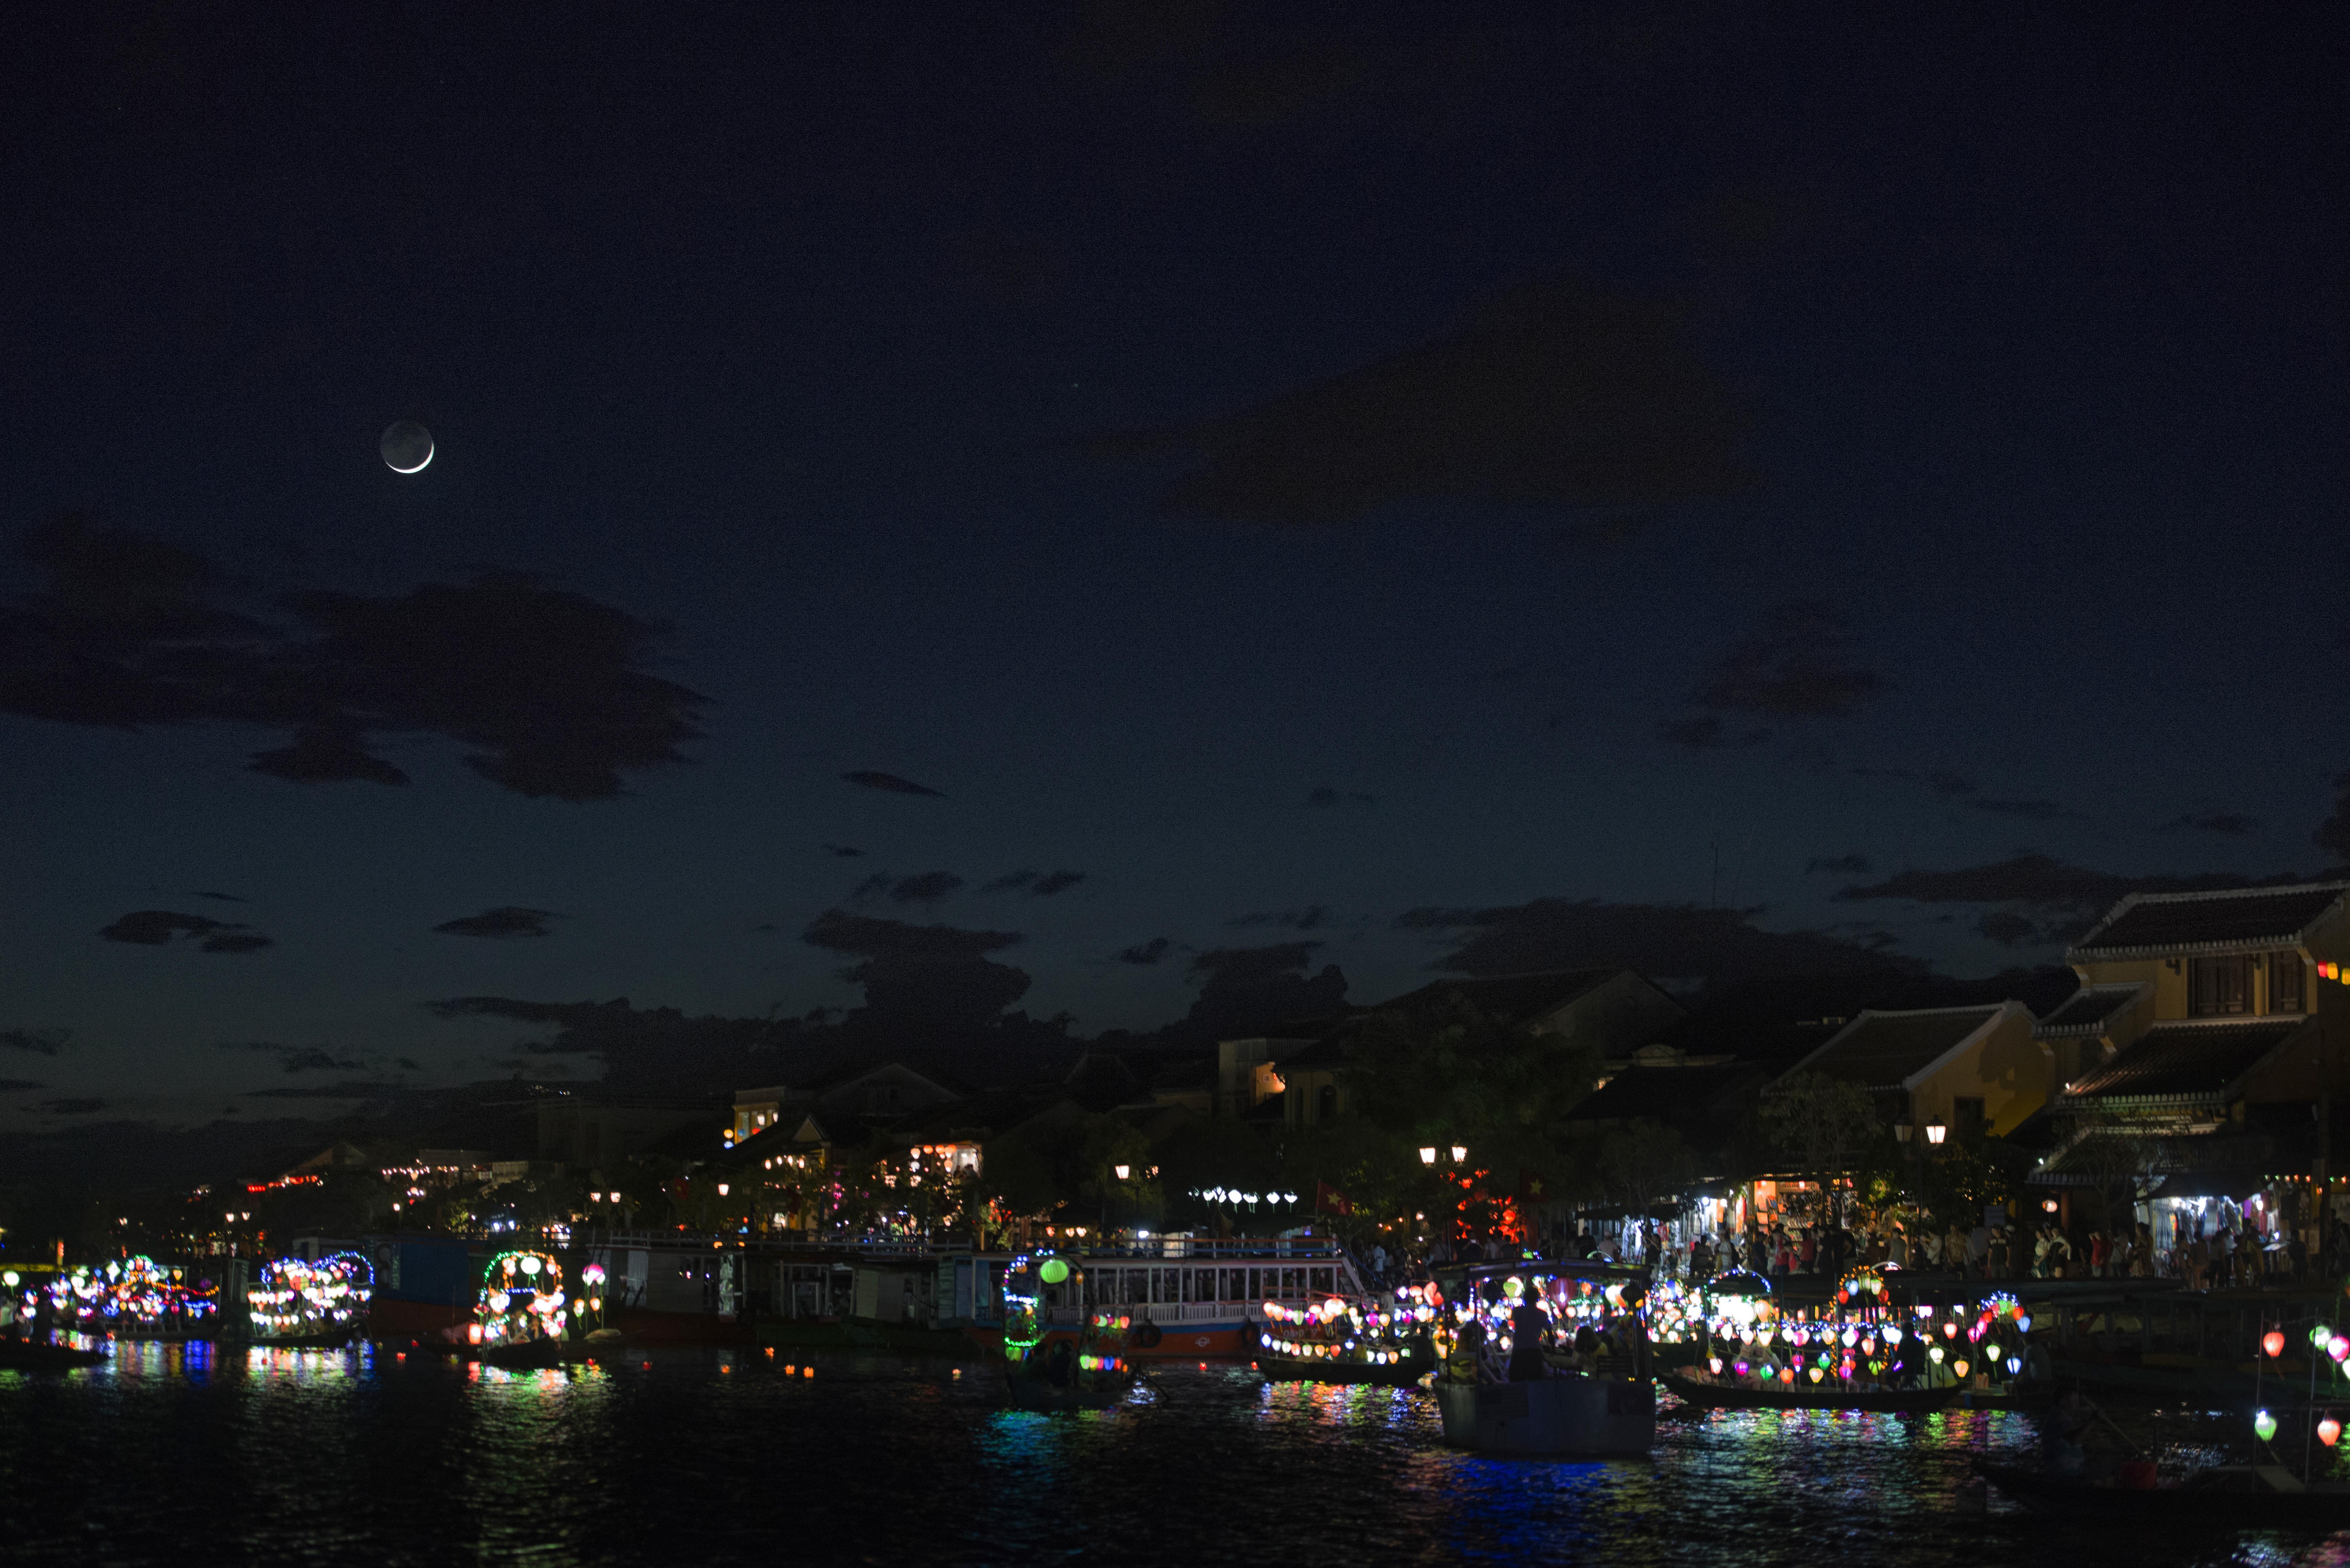 Hoi An Night Sky